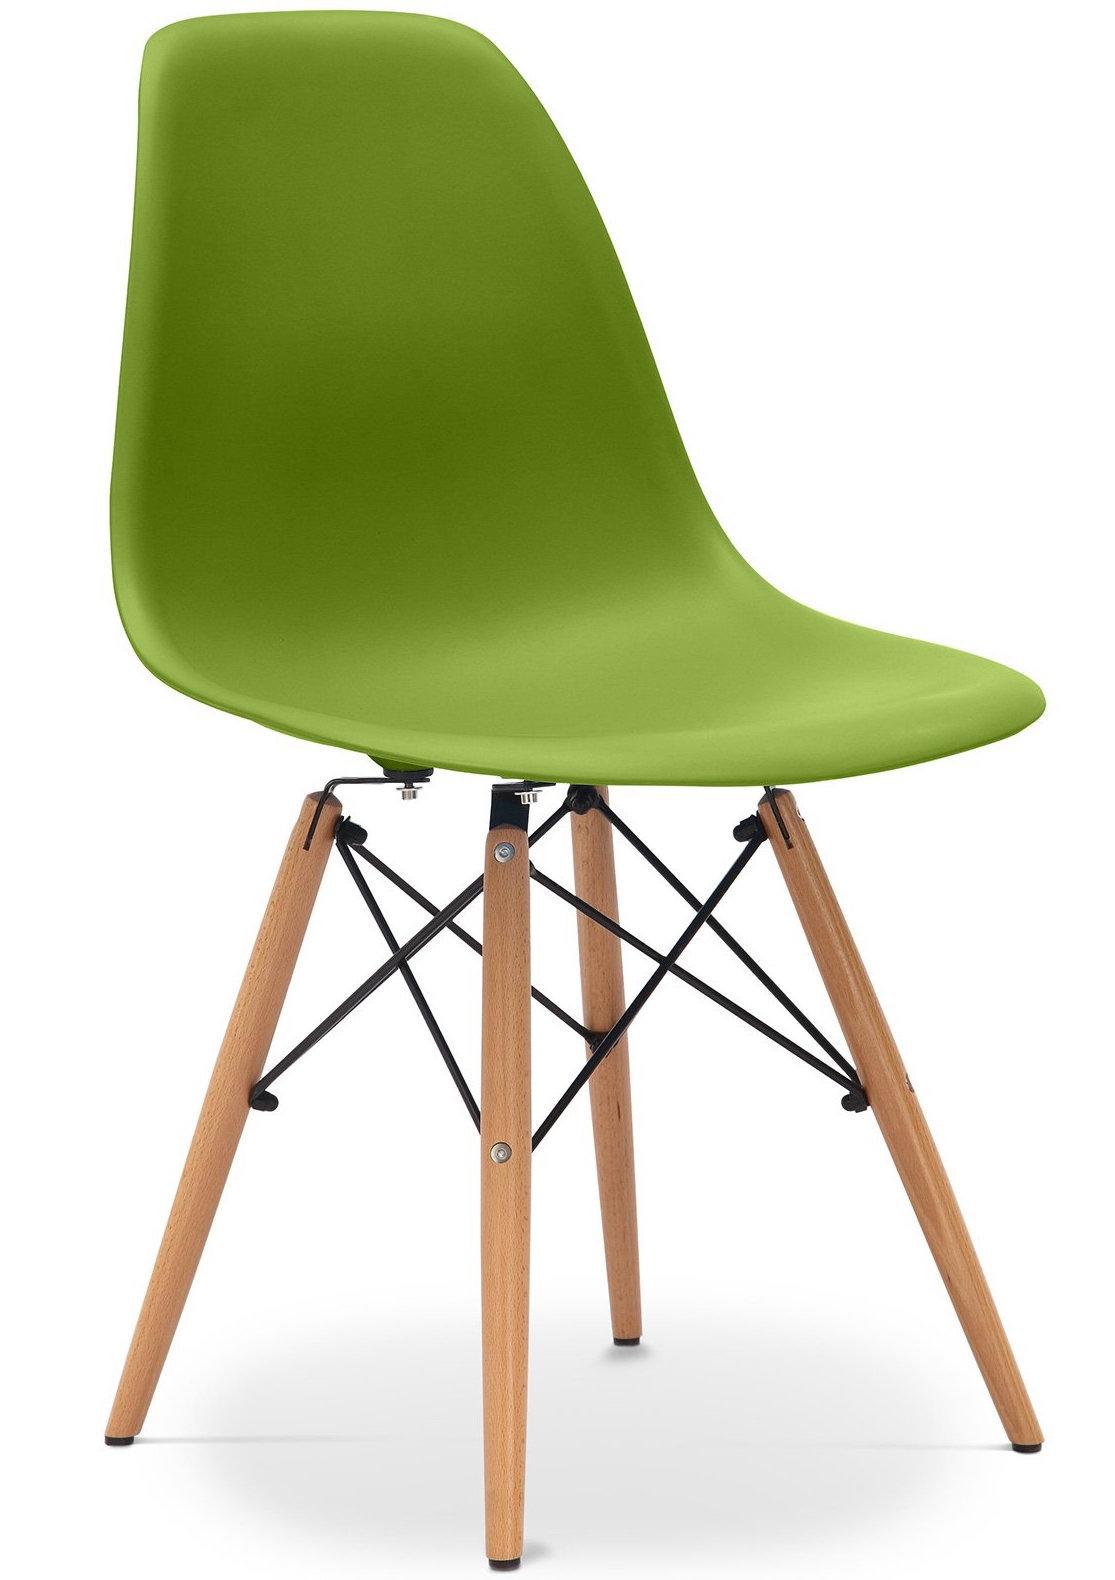 chaise olive mat pieds h tre clair inspir e dsw. Black Bedroom Furniture Sets. Home Design Ideas